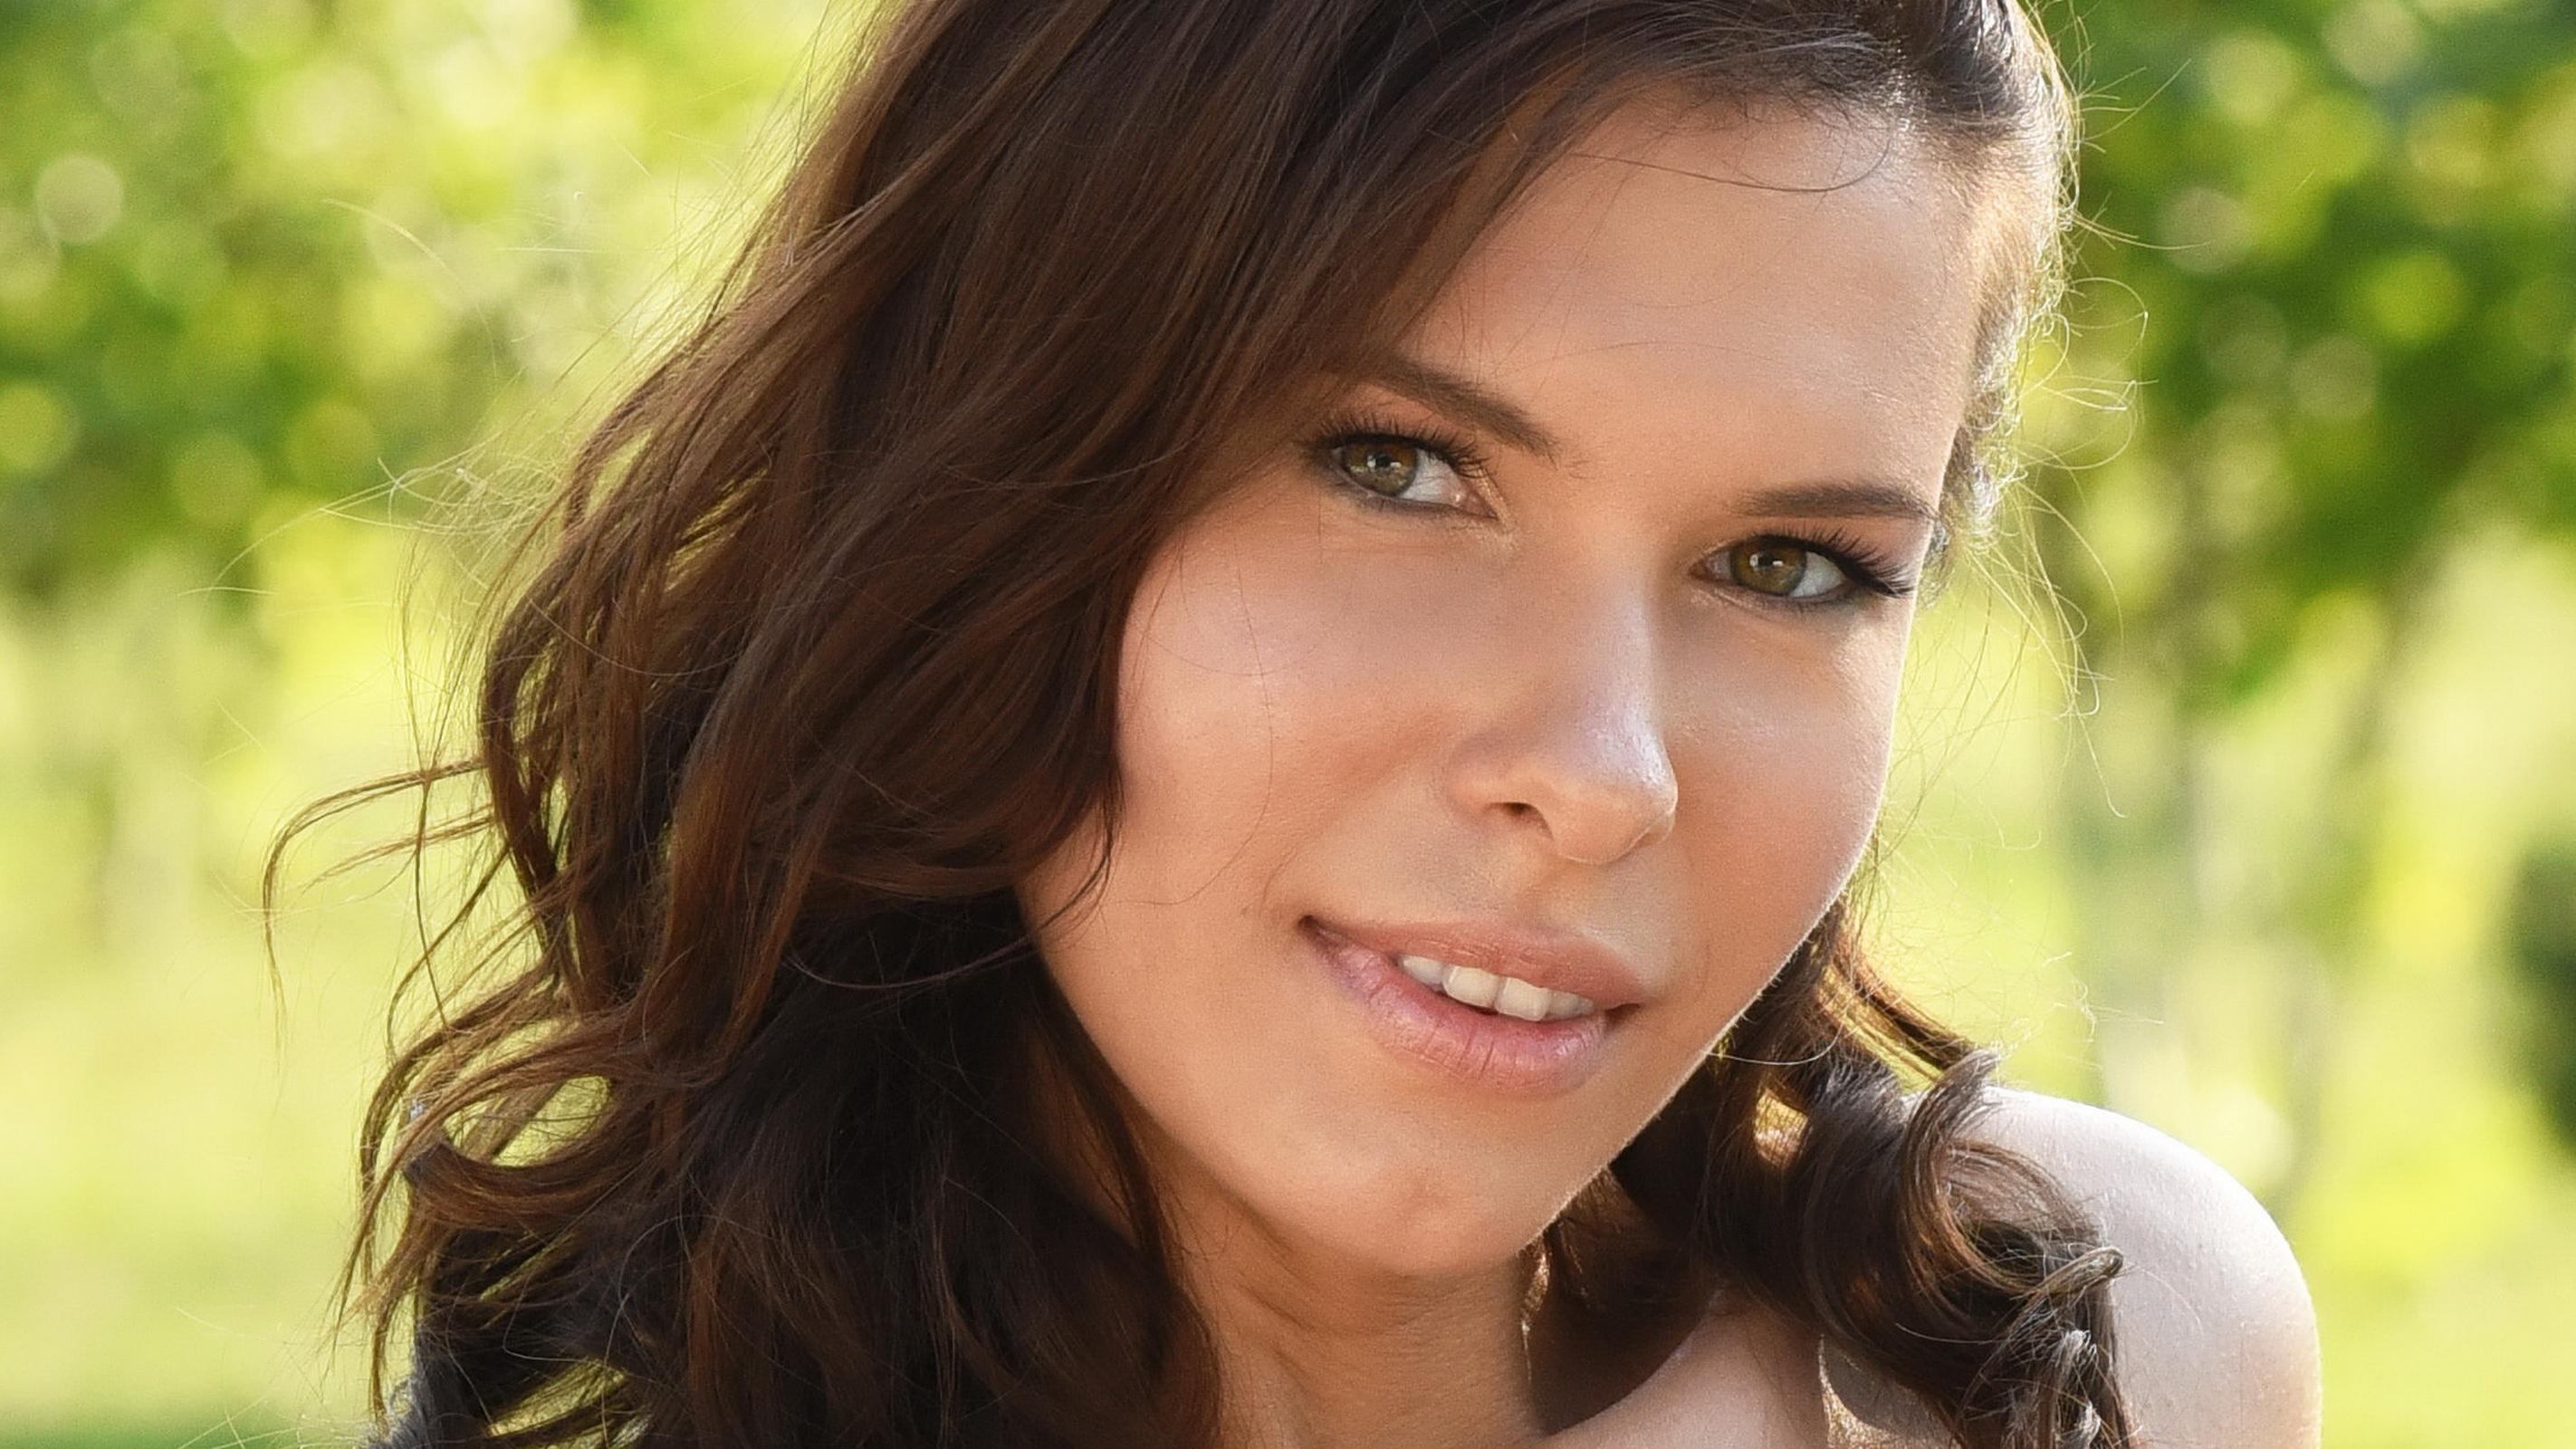 Download photo 1680x1050, metart, brunette, face, cute